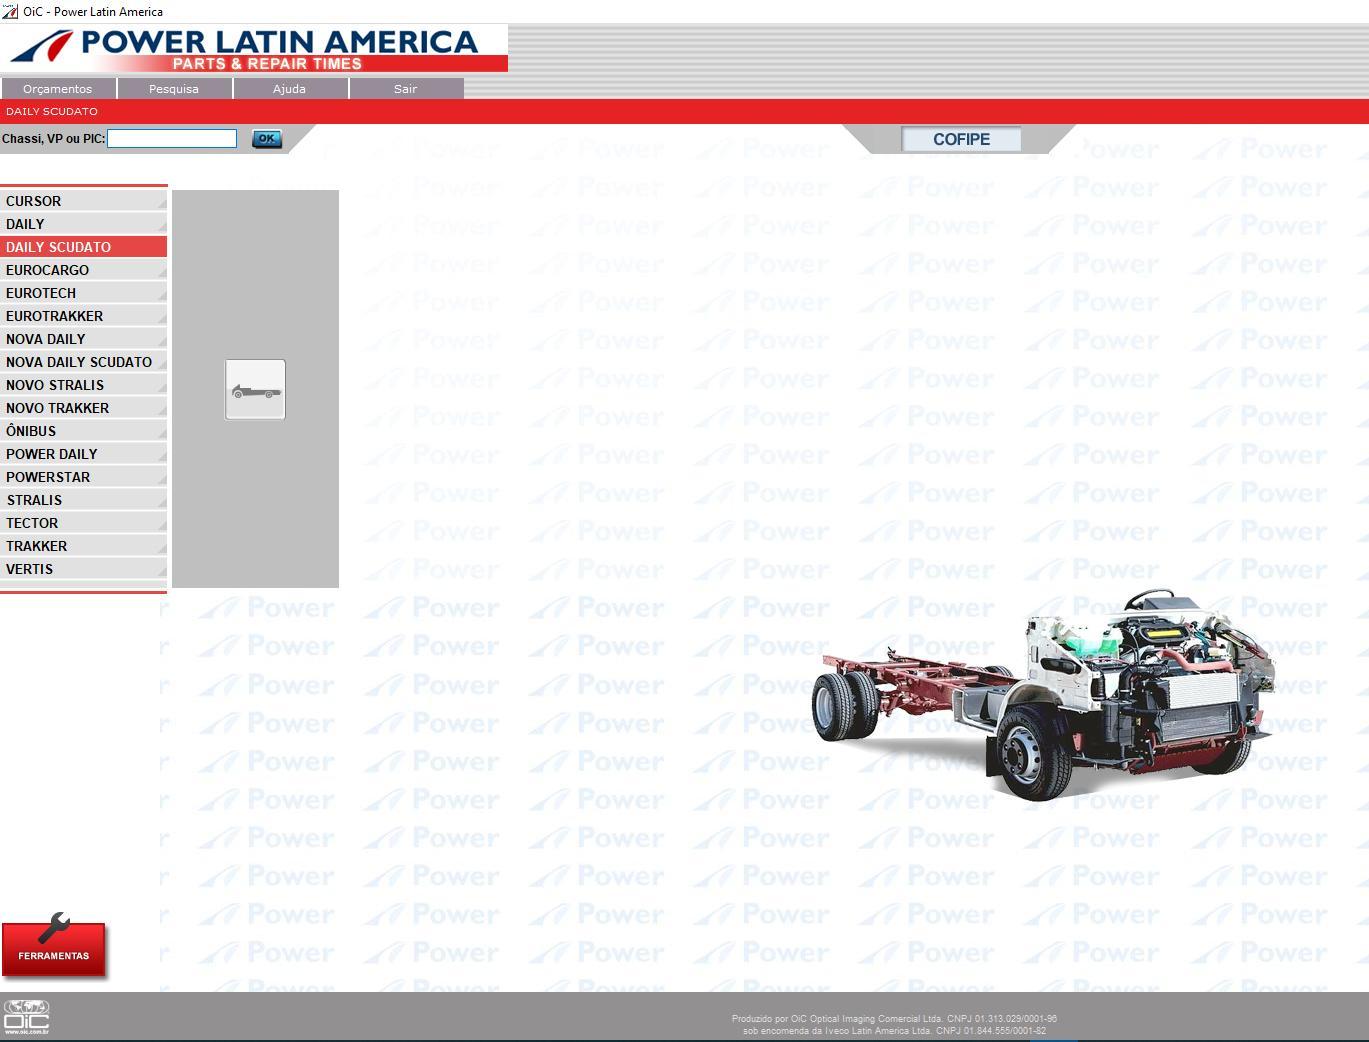 Iveco_Power_Latin_America_OIC_032020_EPC_Spare_Parts_Catalog5